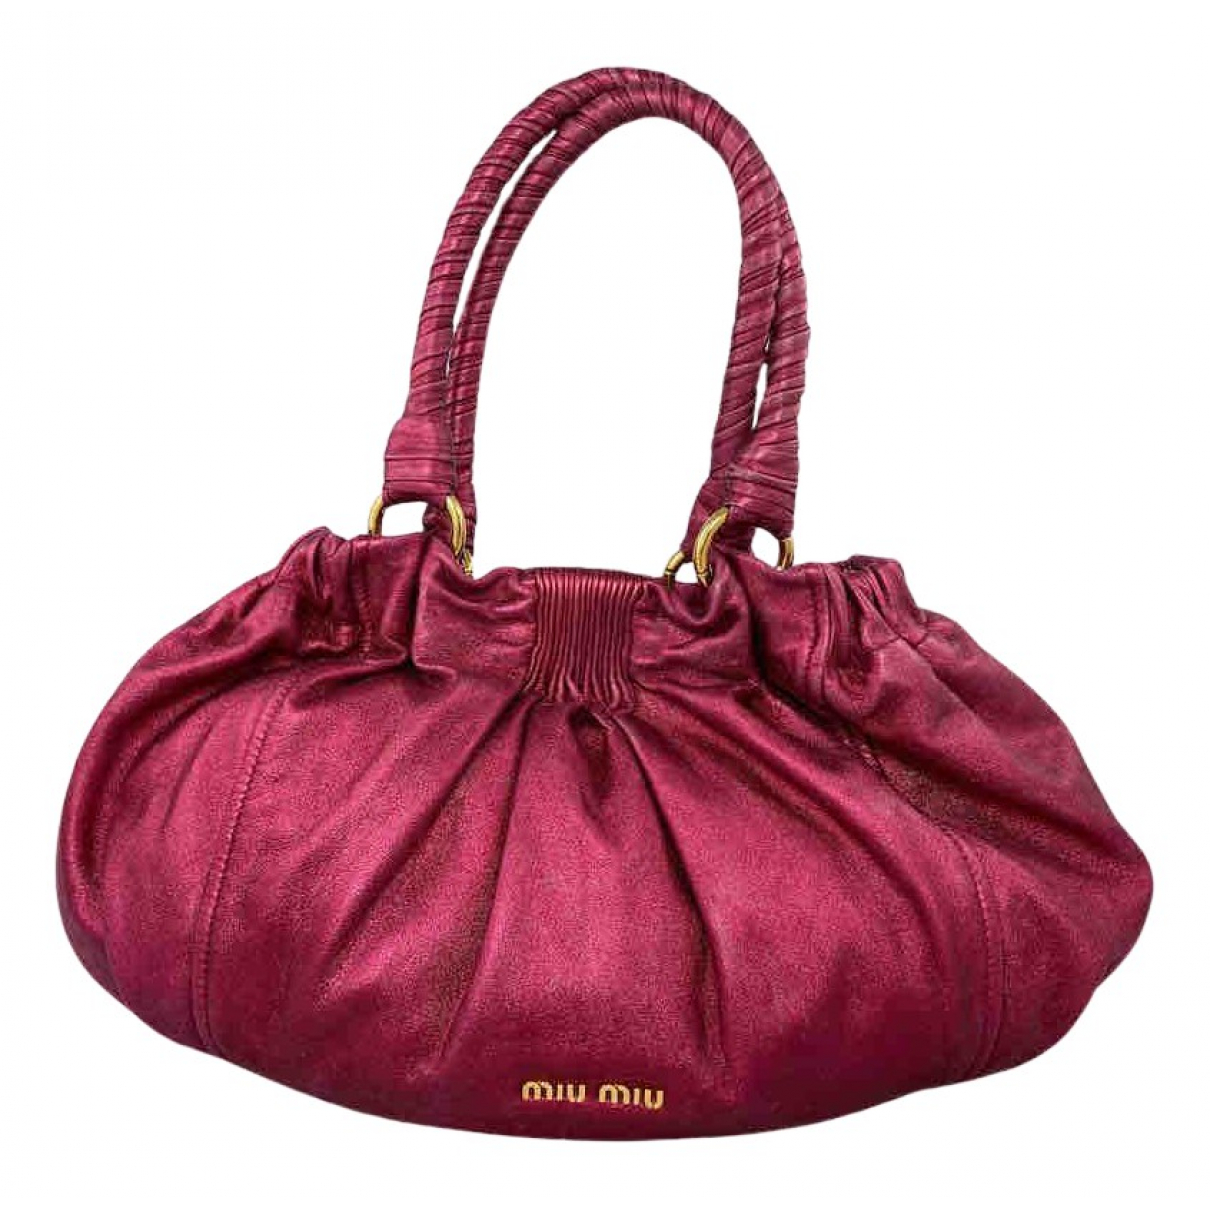 Miu Miu \N Handtasche in  Rosa Leinen